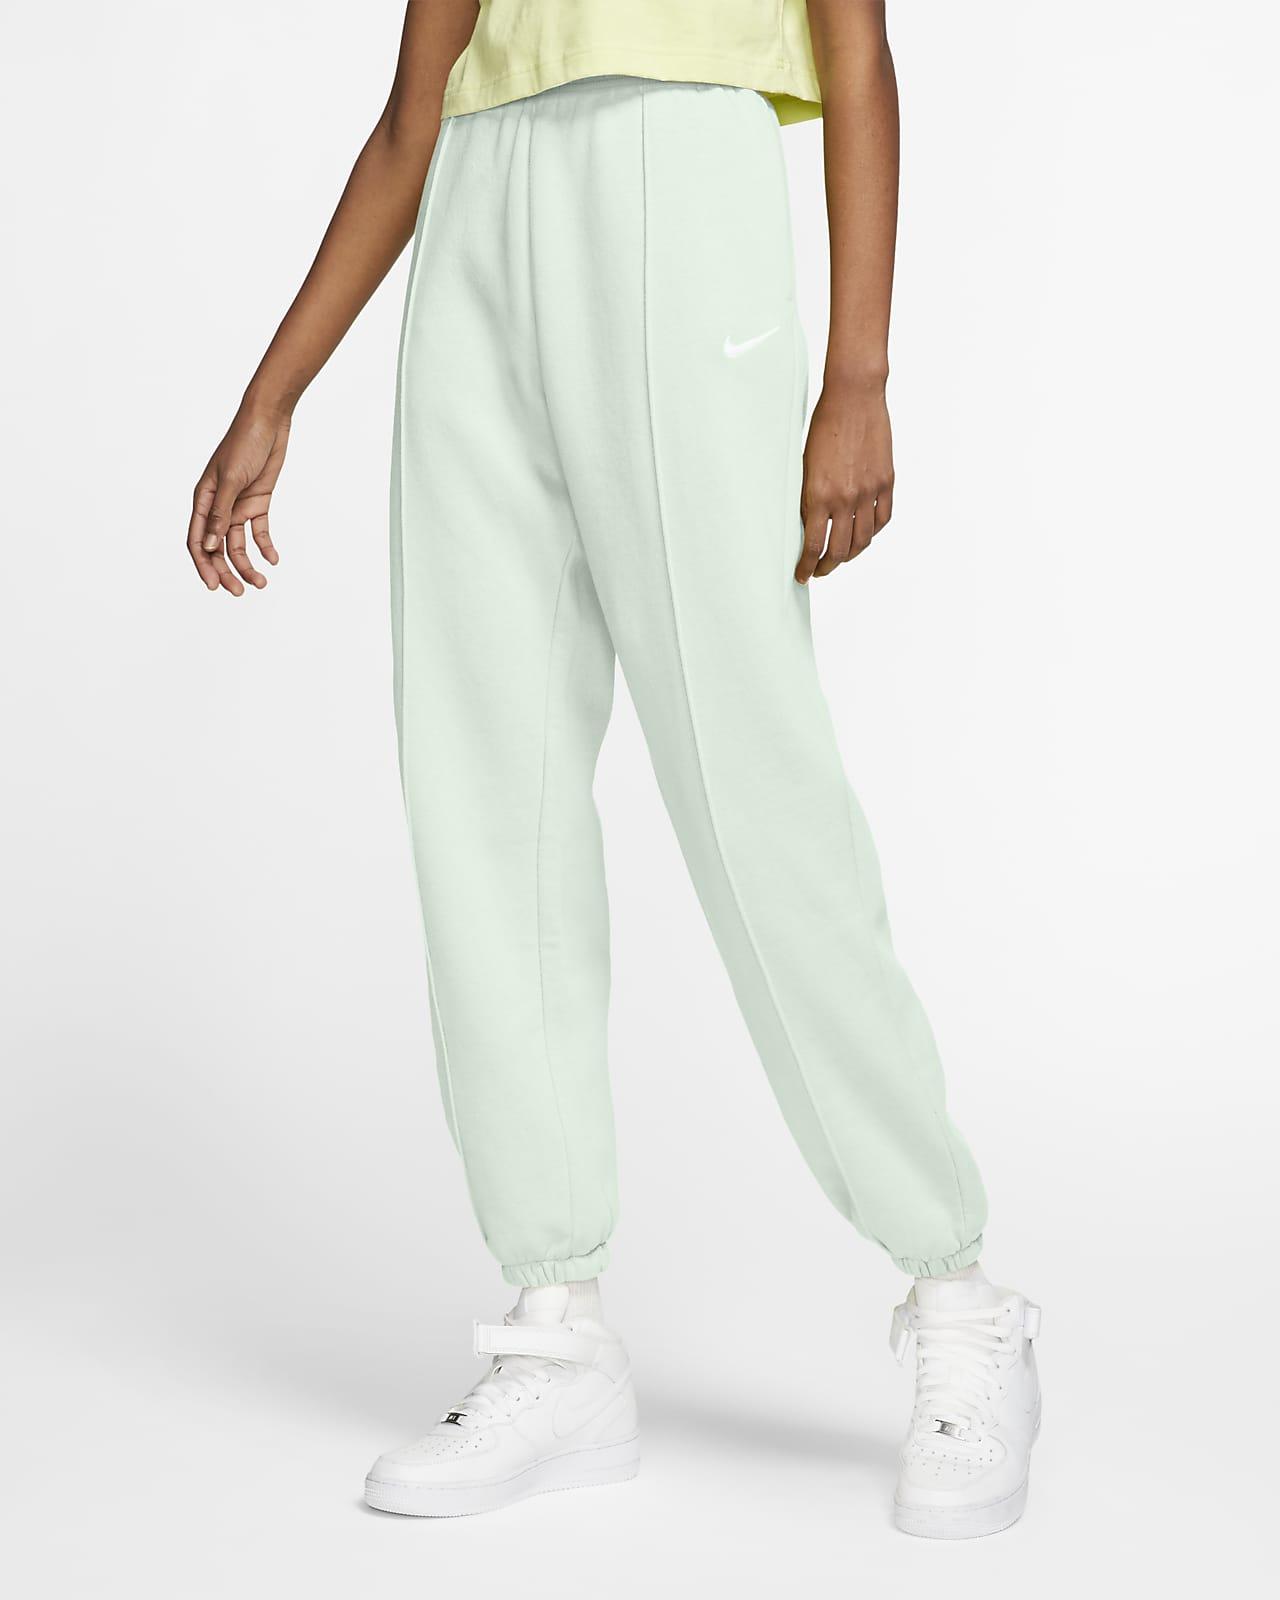 Pantalones de tejido Fleece para mujer Nike Sportswear Essential Collection